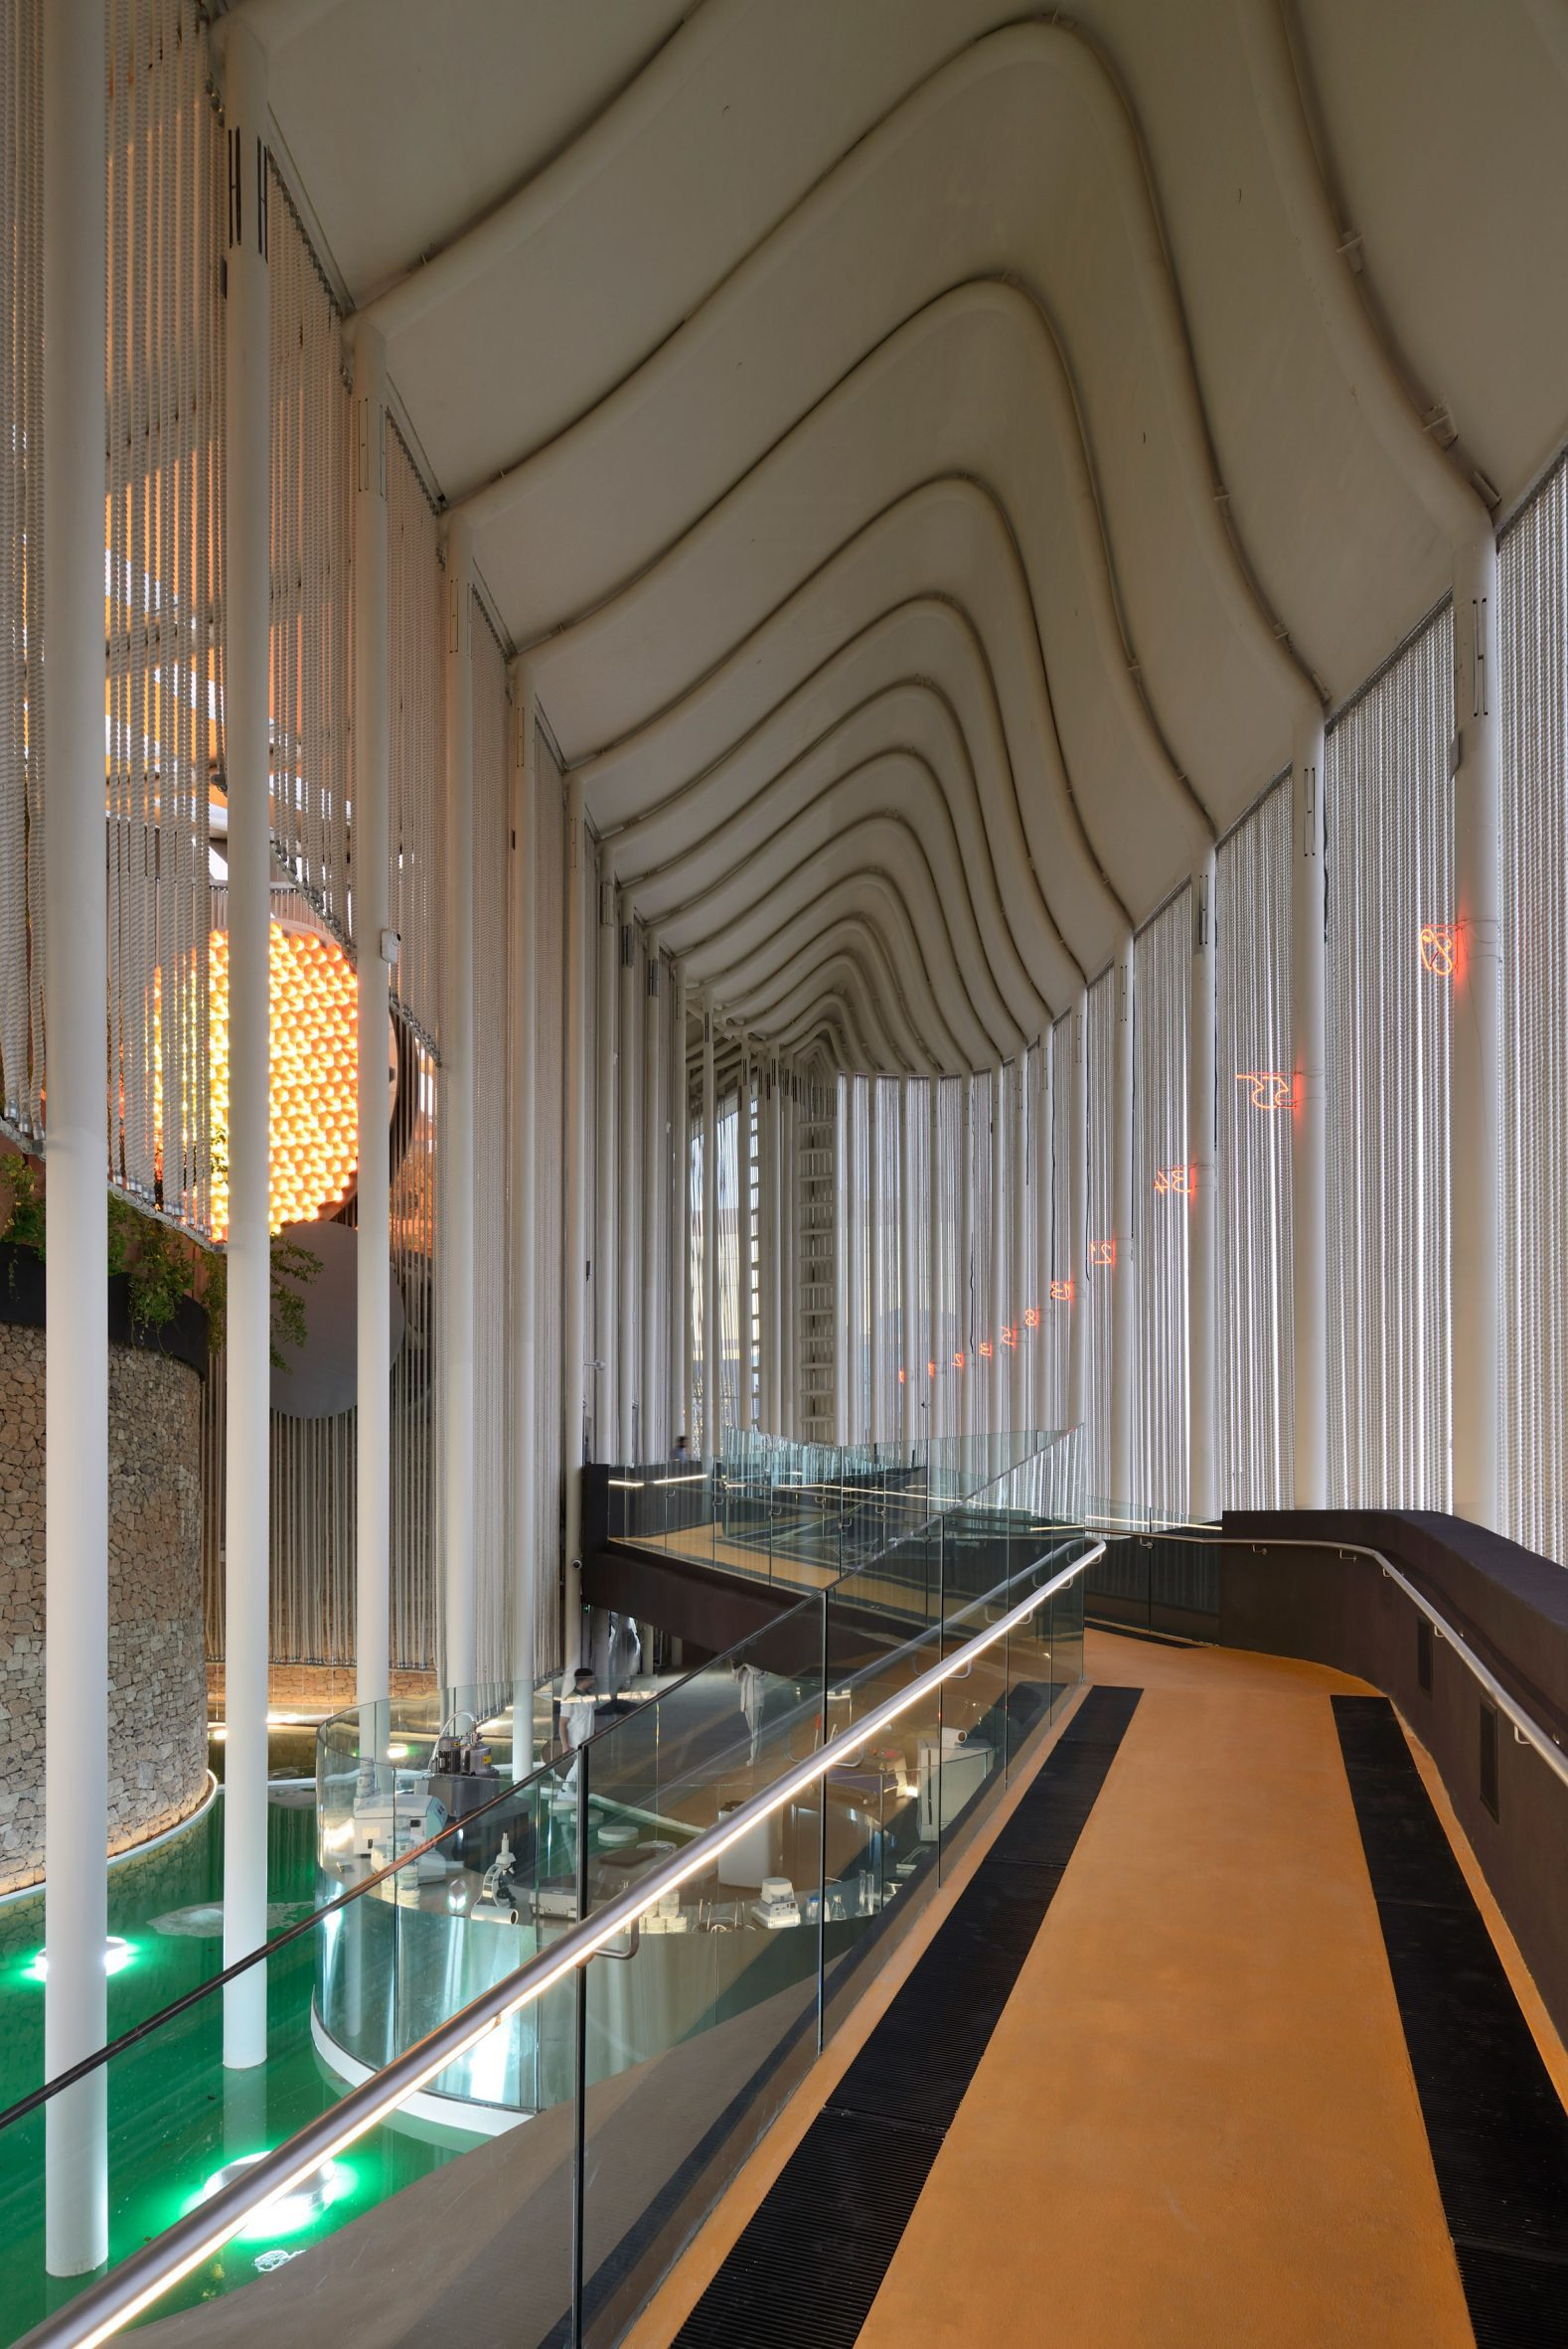 Interior of Italy Pavilion at Dubai Expo